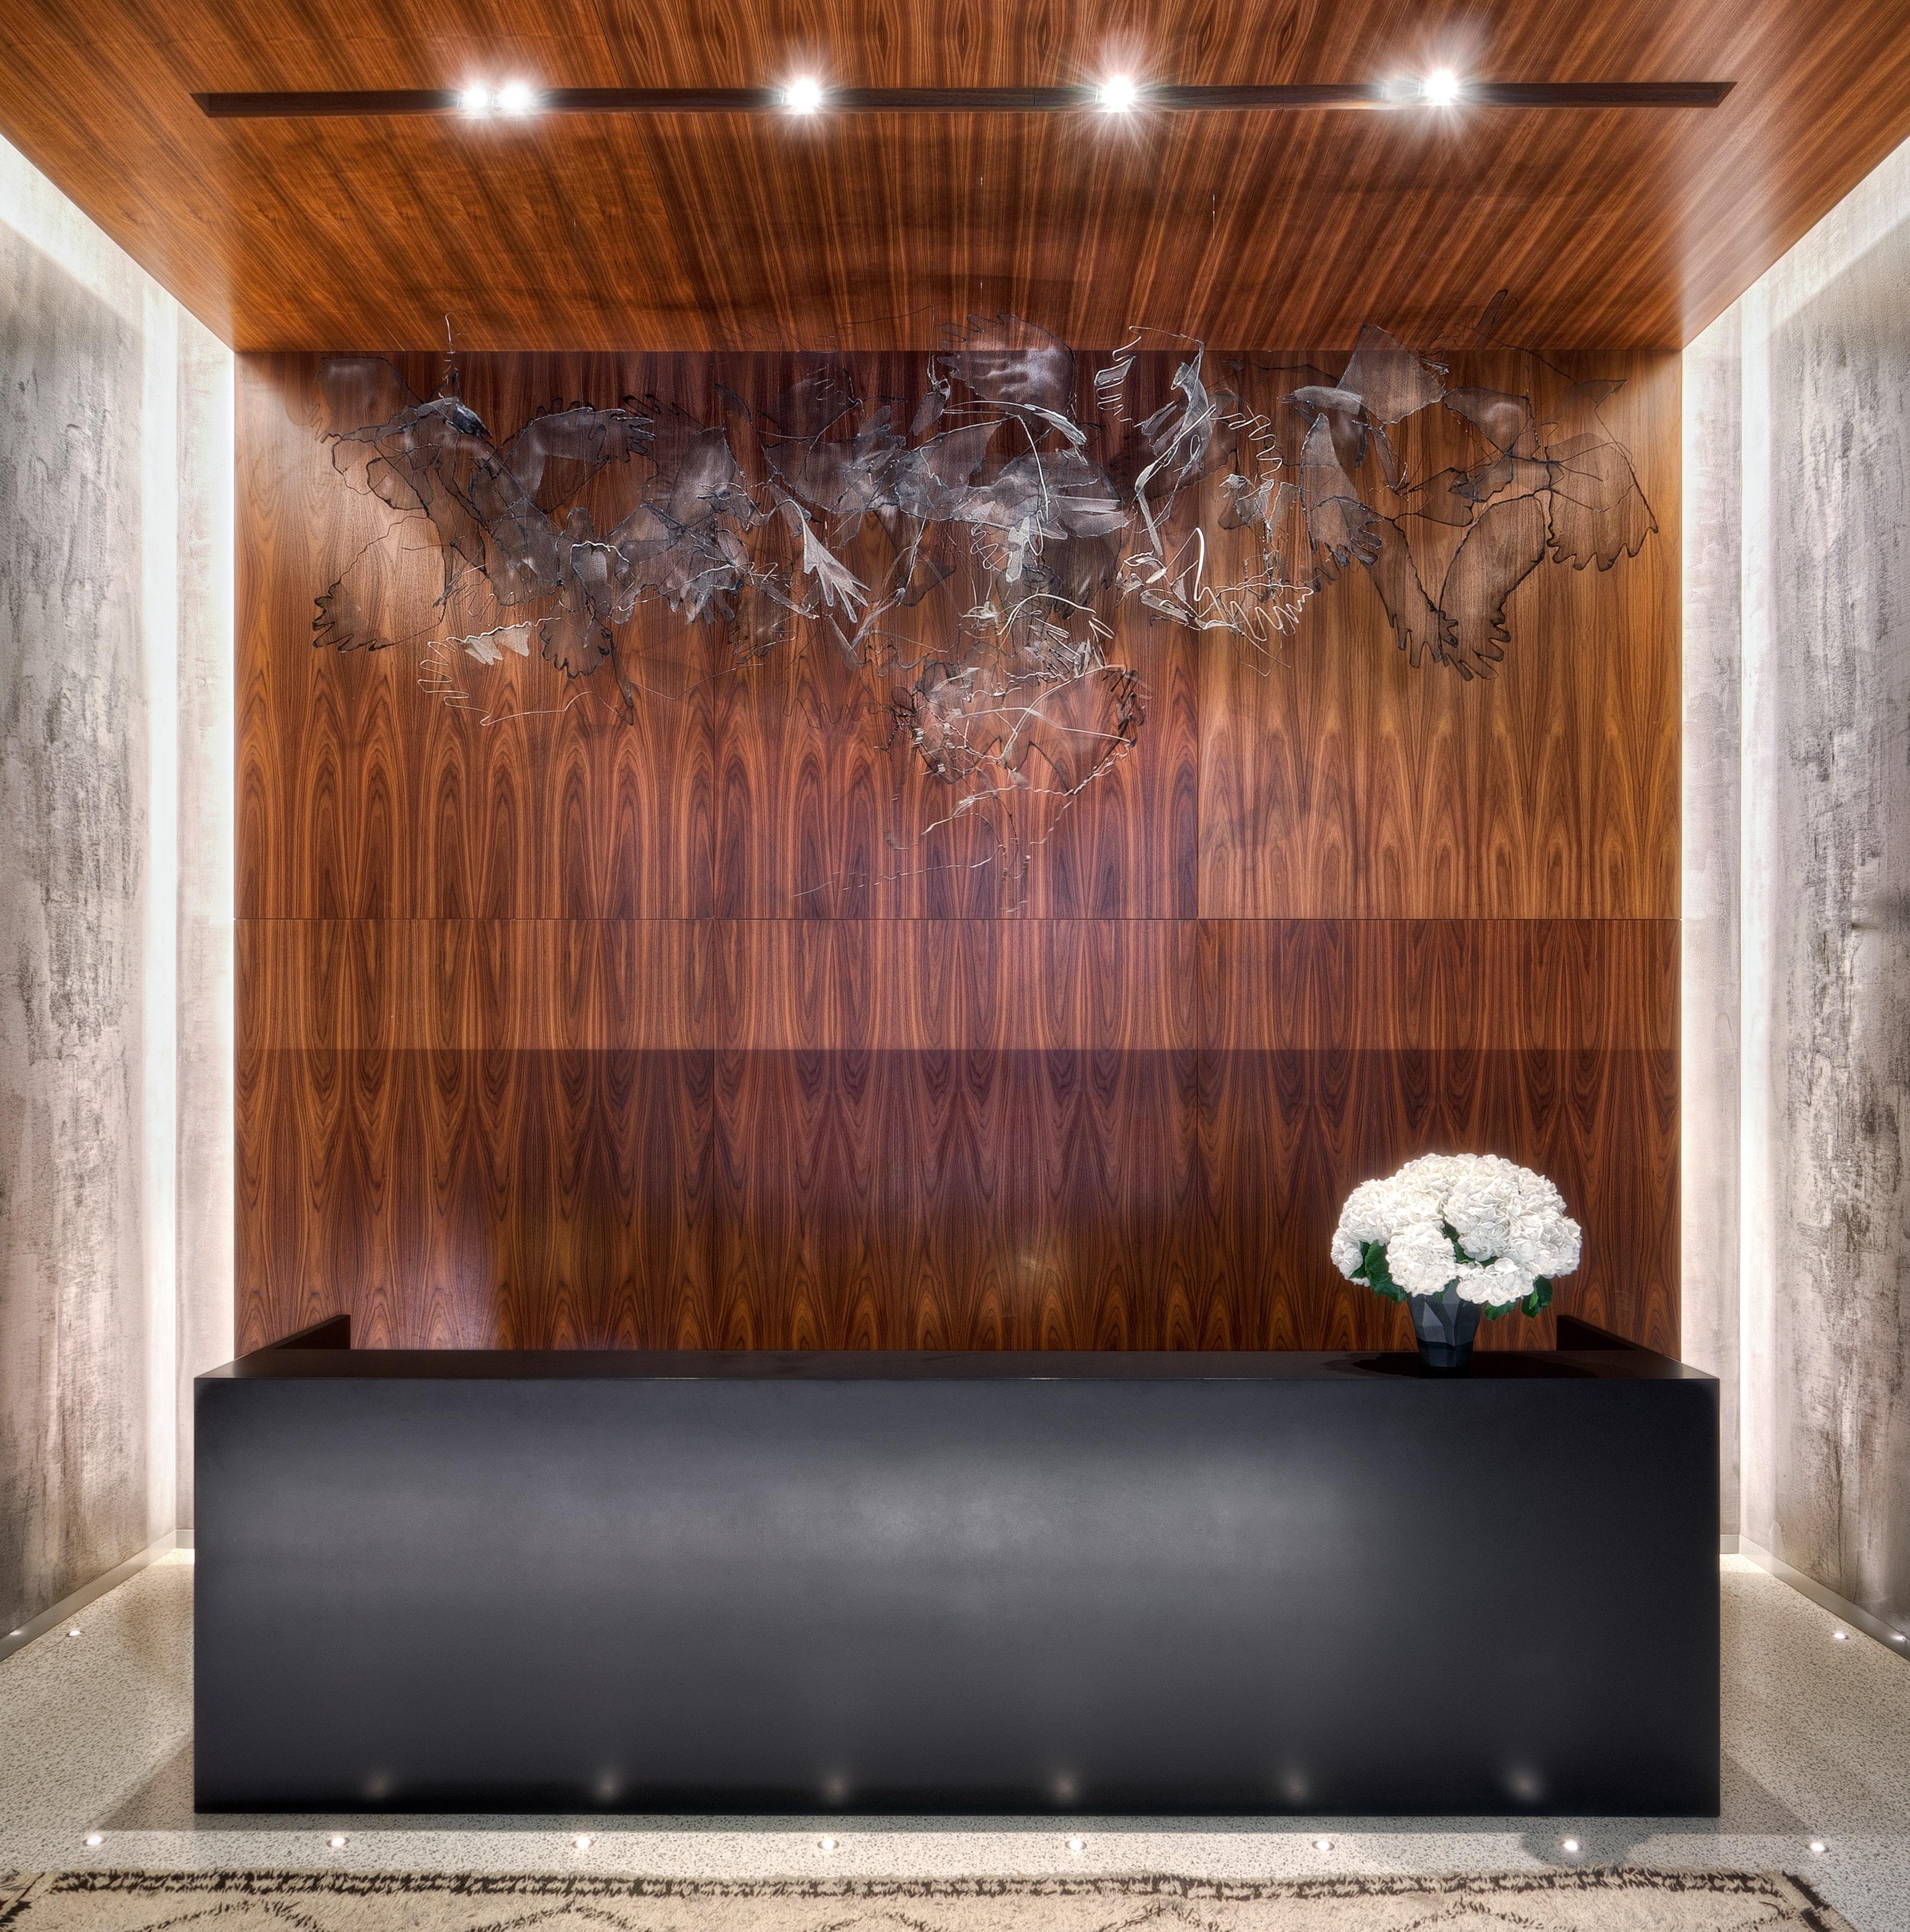 Atelier CJC Architecture and Interior Design